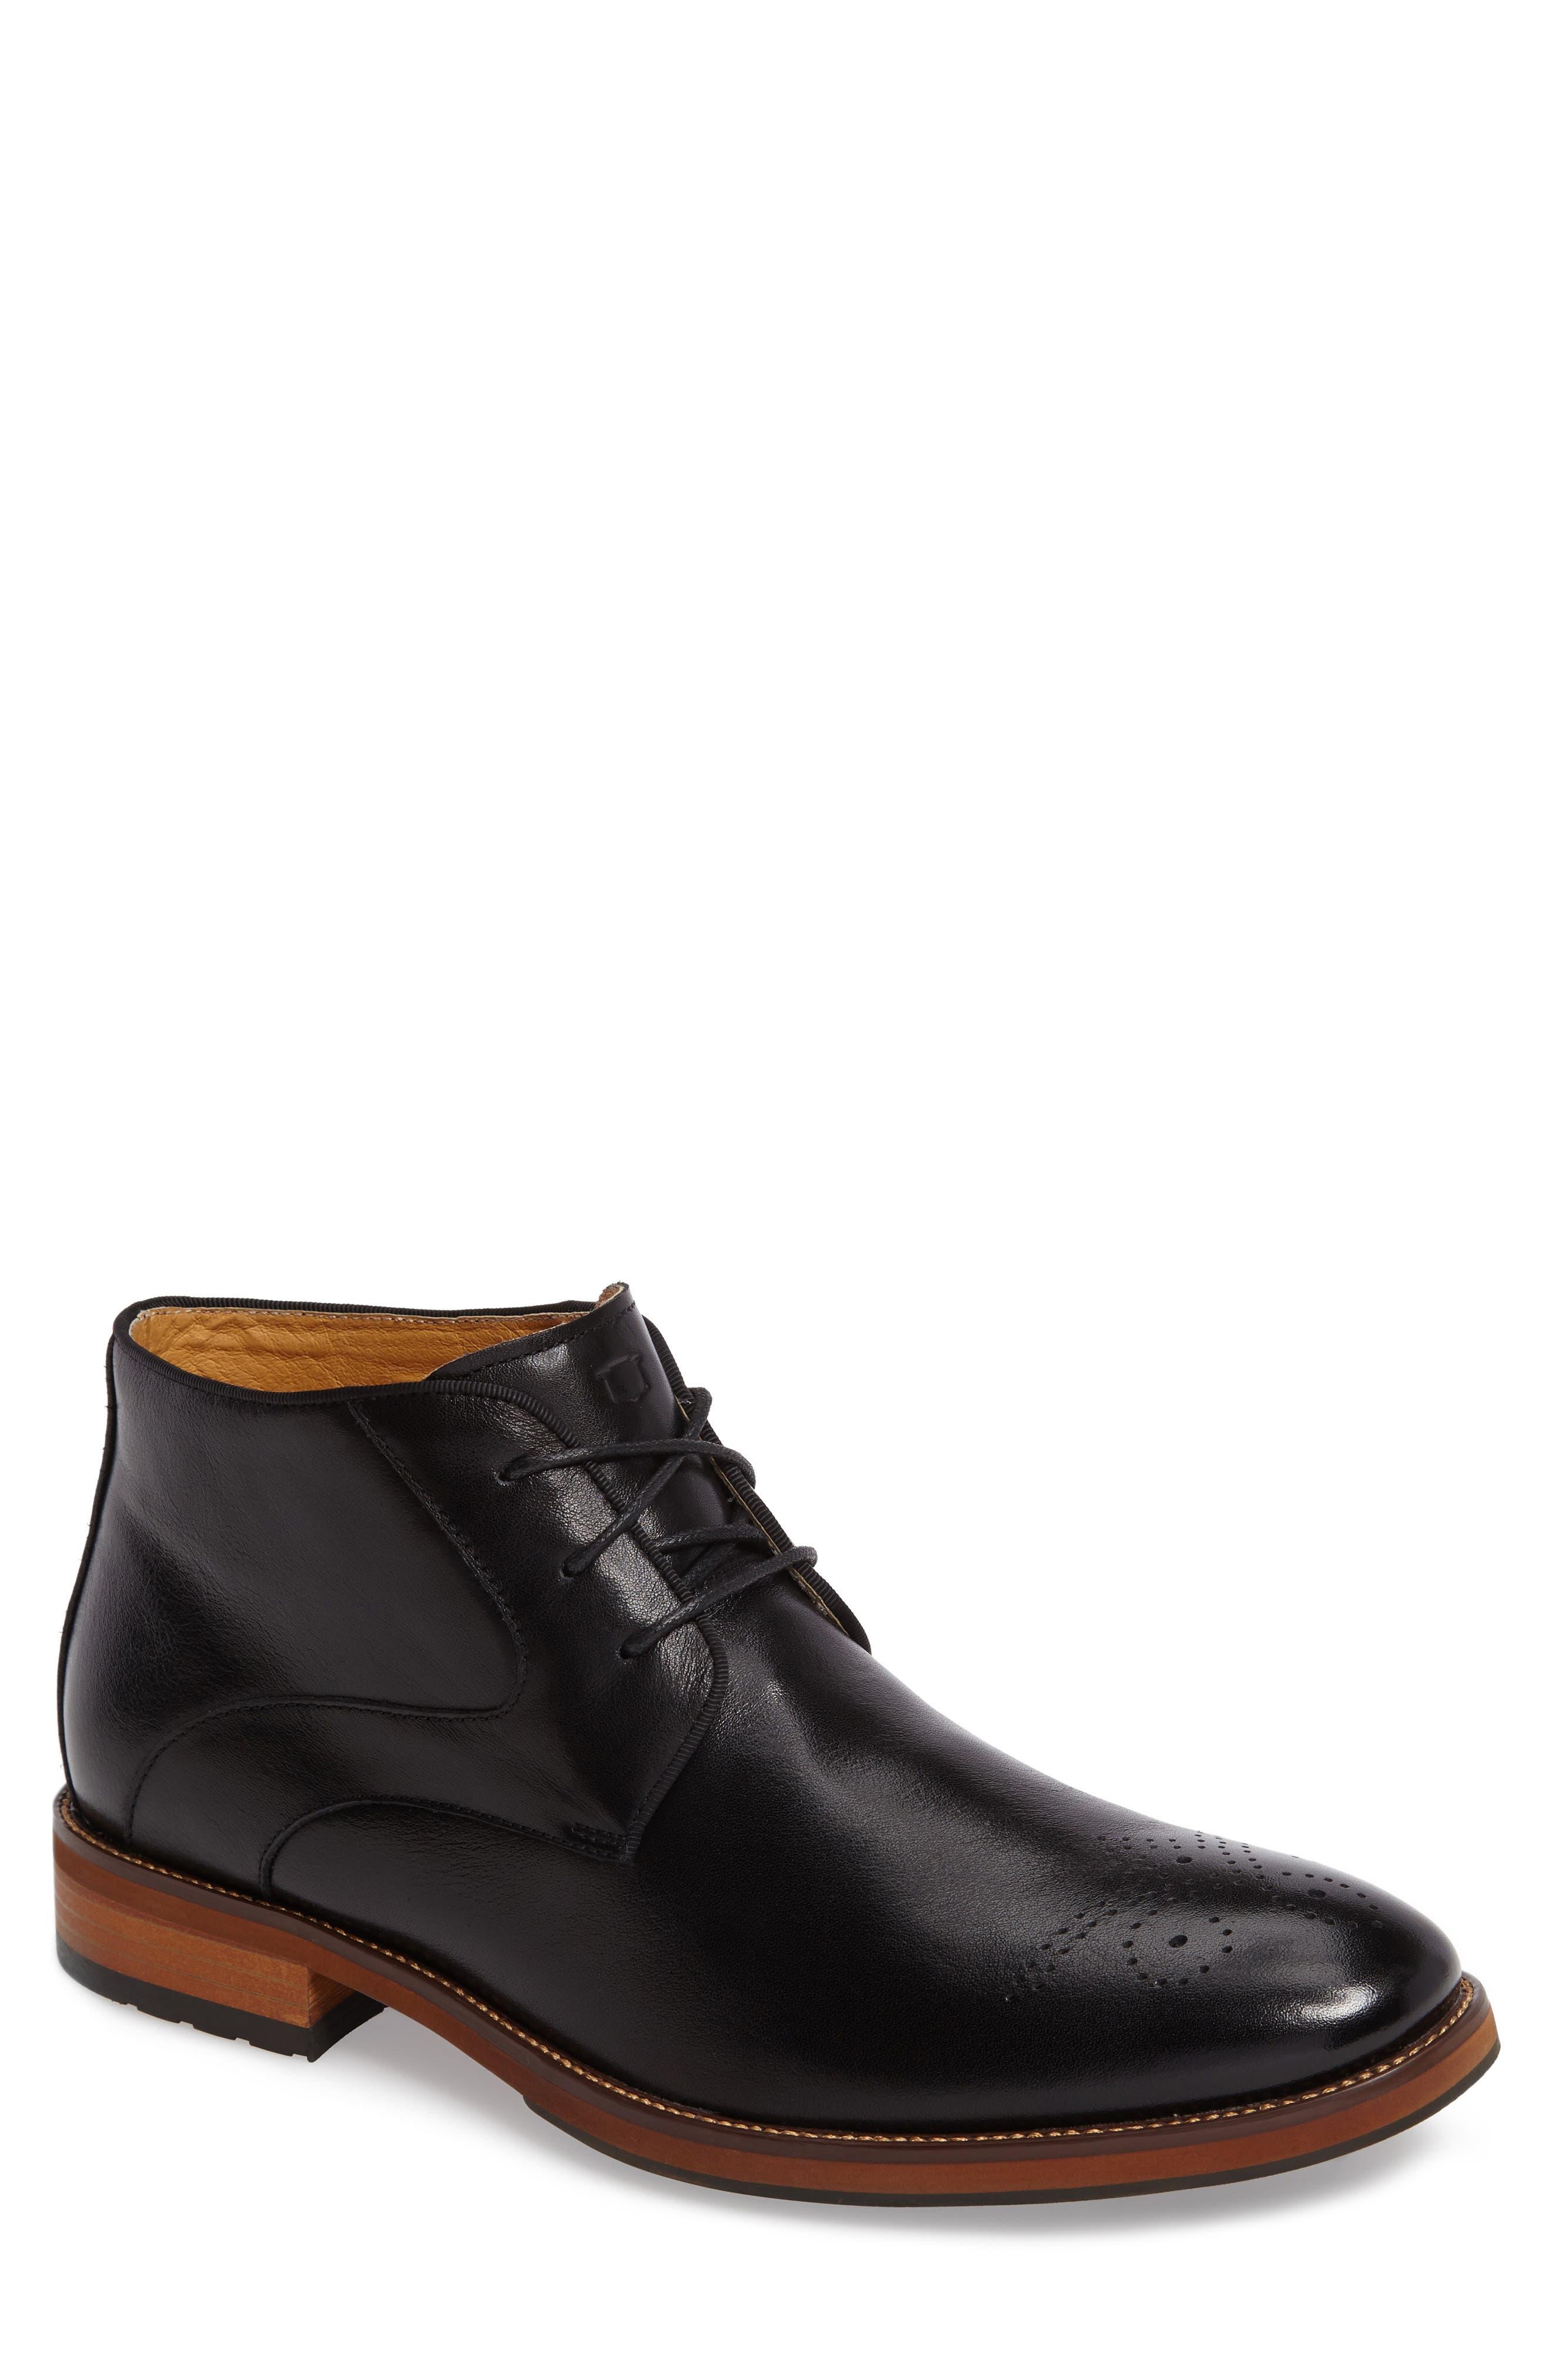 Florsheim Blaze Chukka Boot, Black